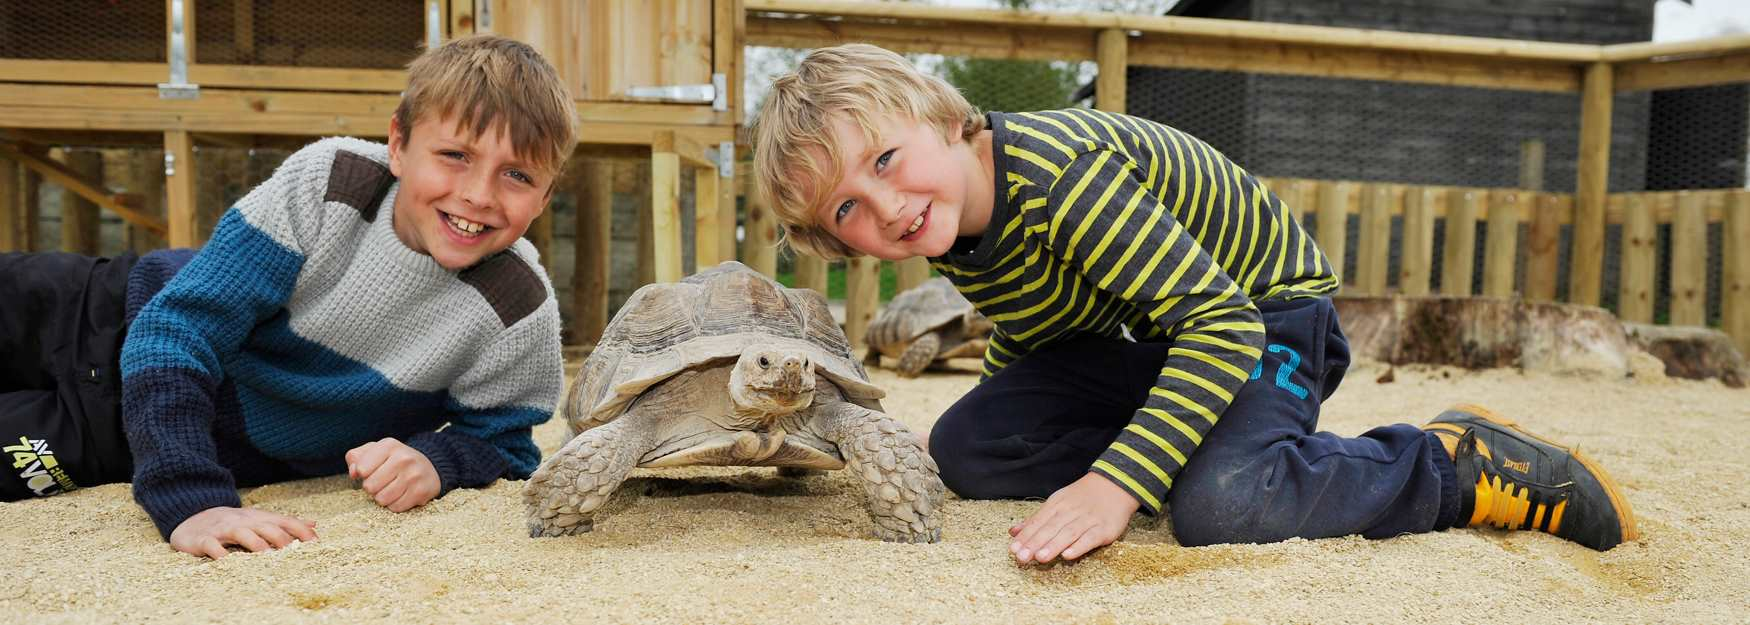 Birdland Giant Tortoises